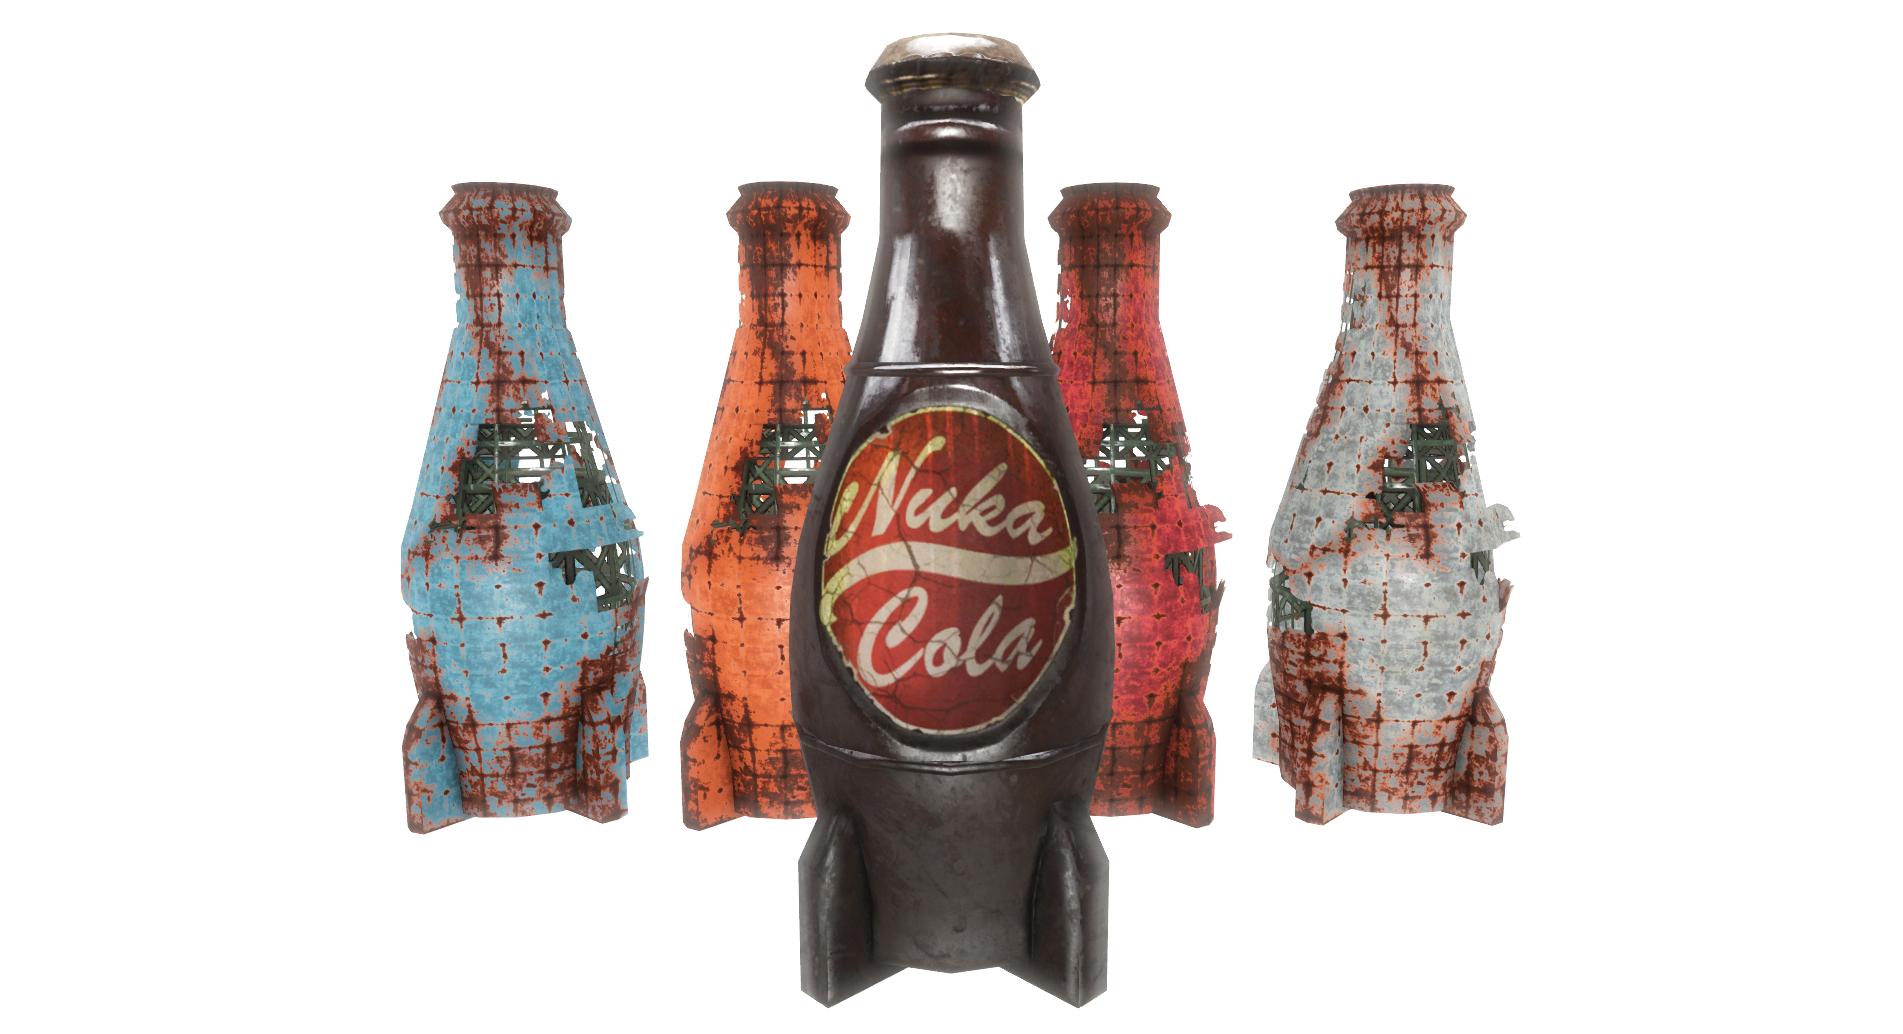 nuka cola bottle nuka world fallout wiki fandom powered by wikia. Black Bedroom Furniture Sets. Home Design Ideas